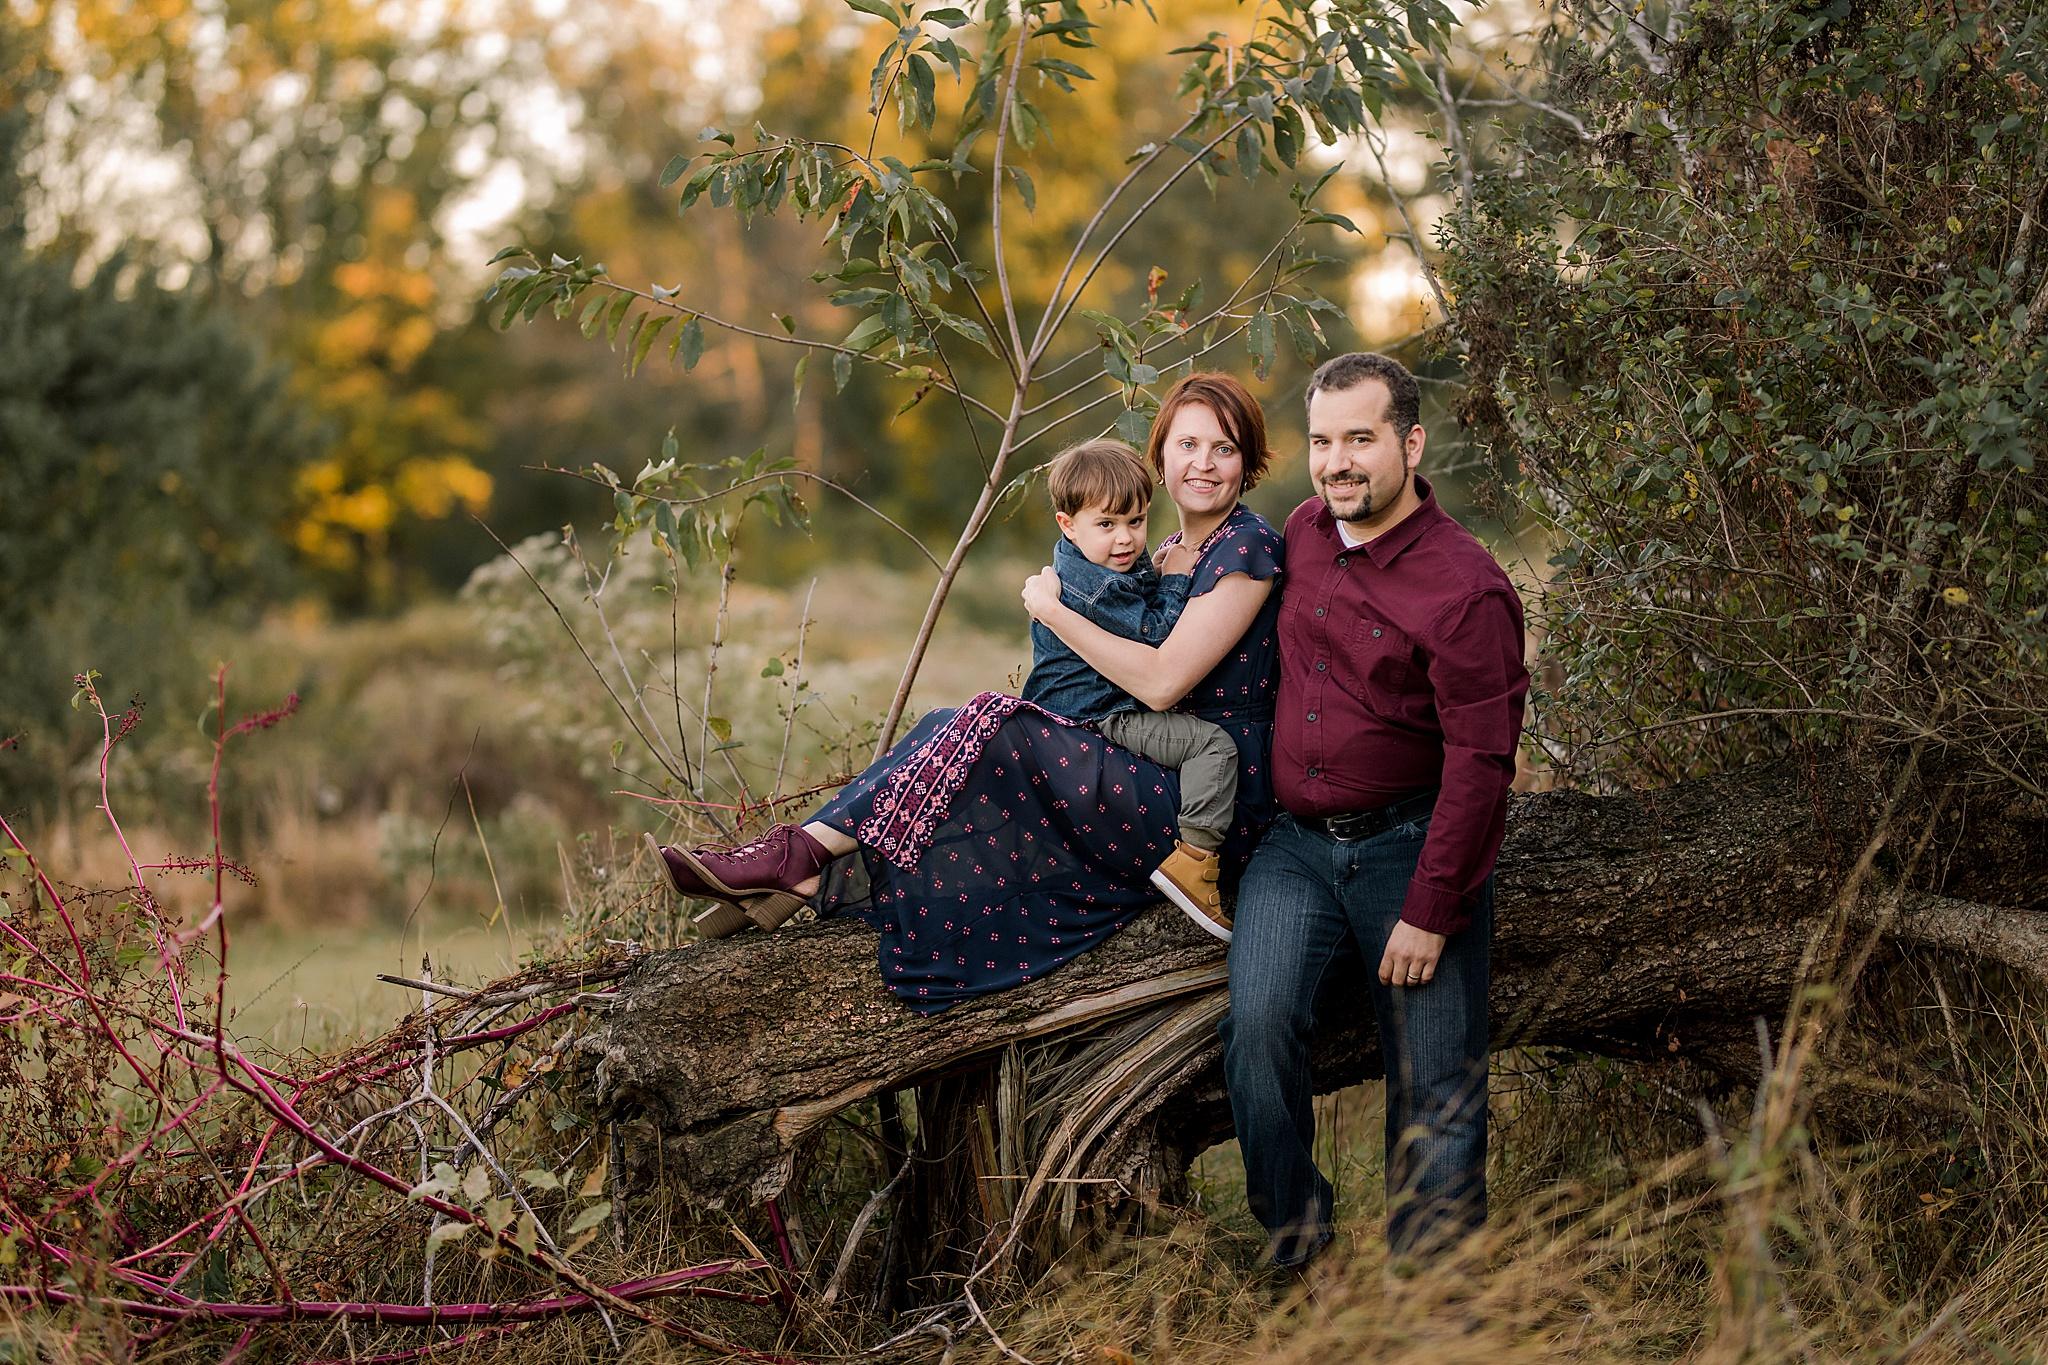 AnneMarie_Hamant_family_photographer_lehigh_valley_pa_0186.jpg